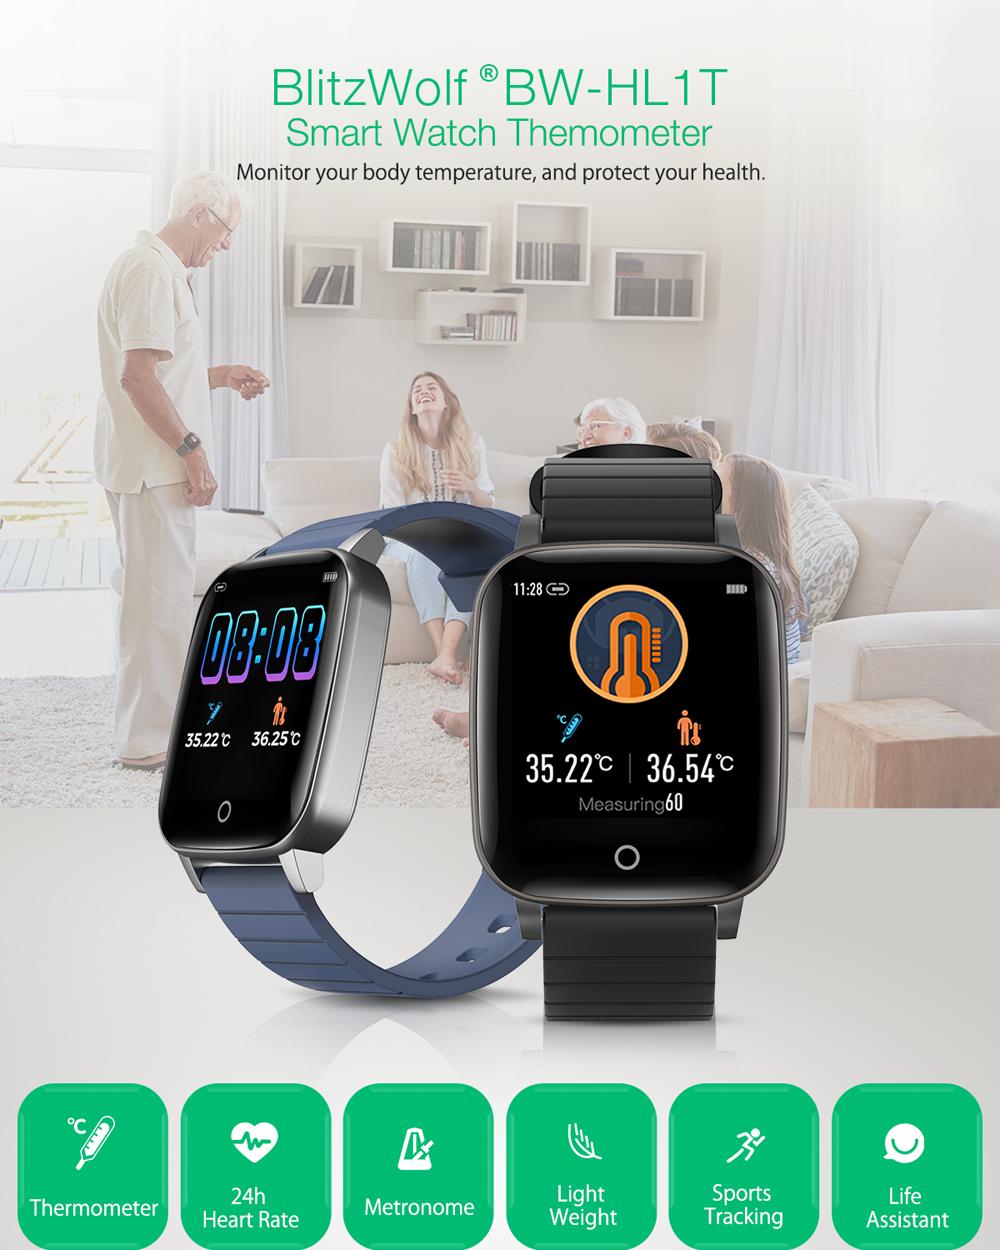 Blitzwolf BW-HL1T smart watch